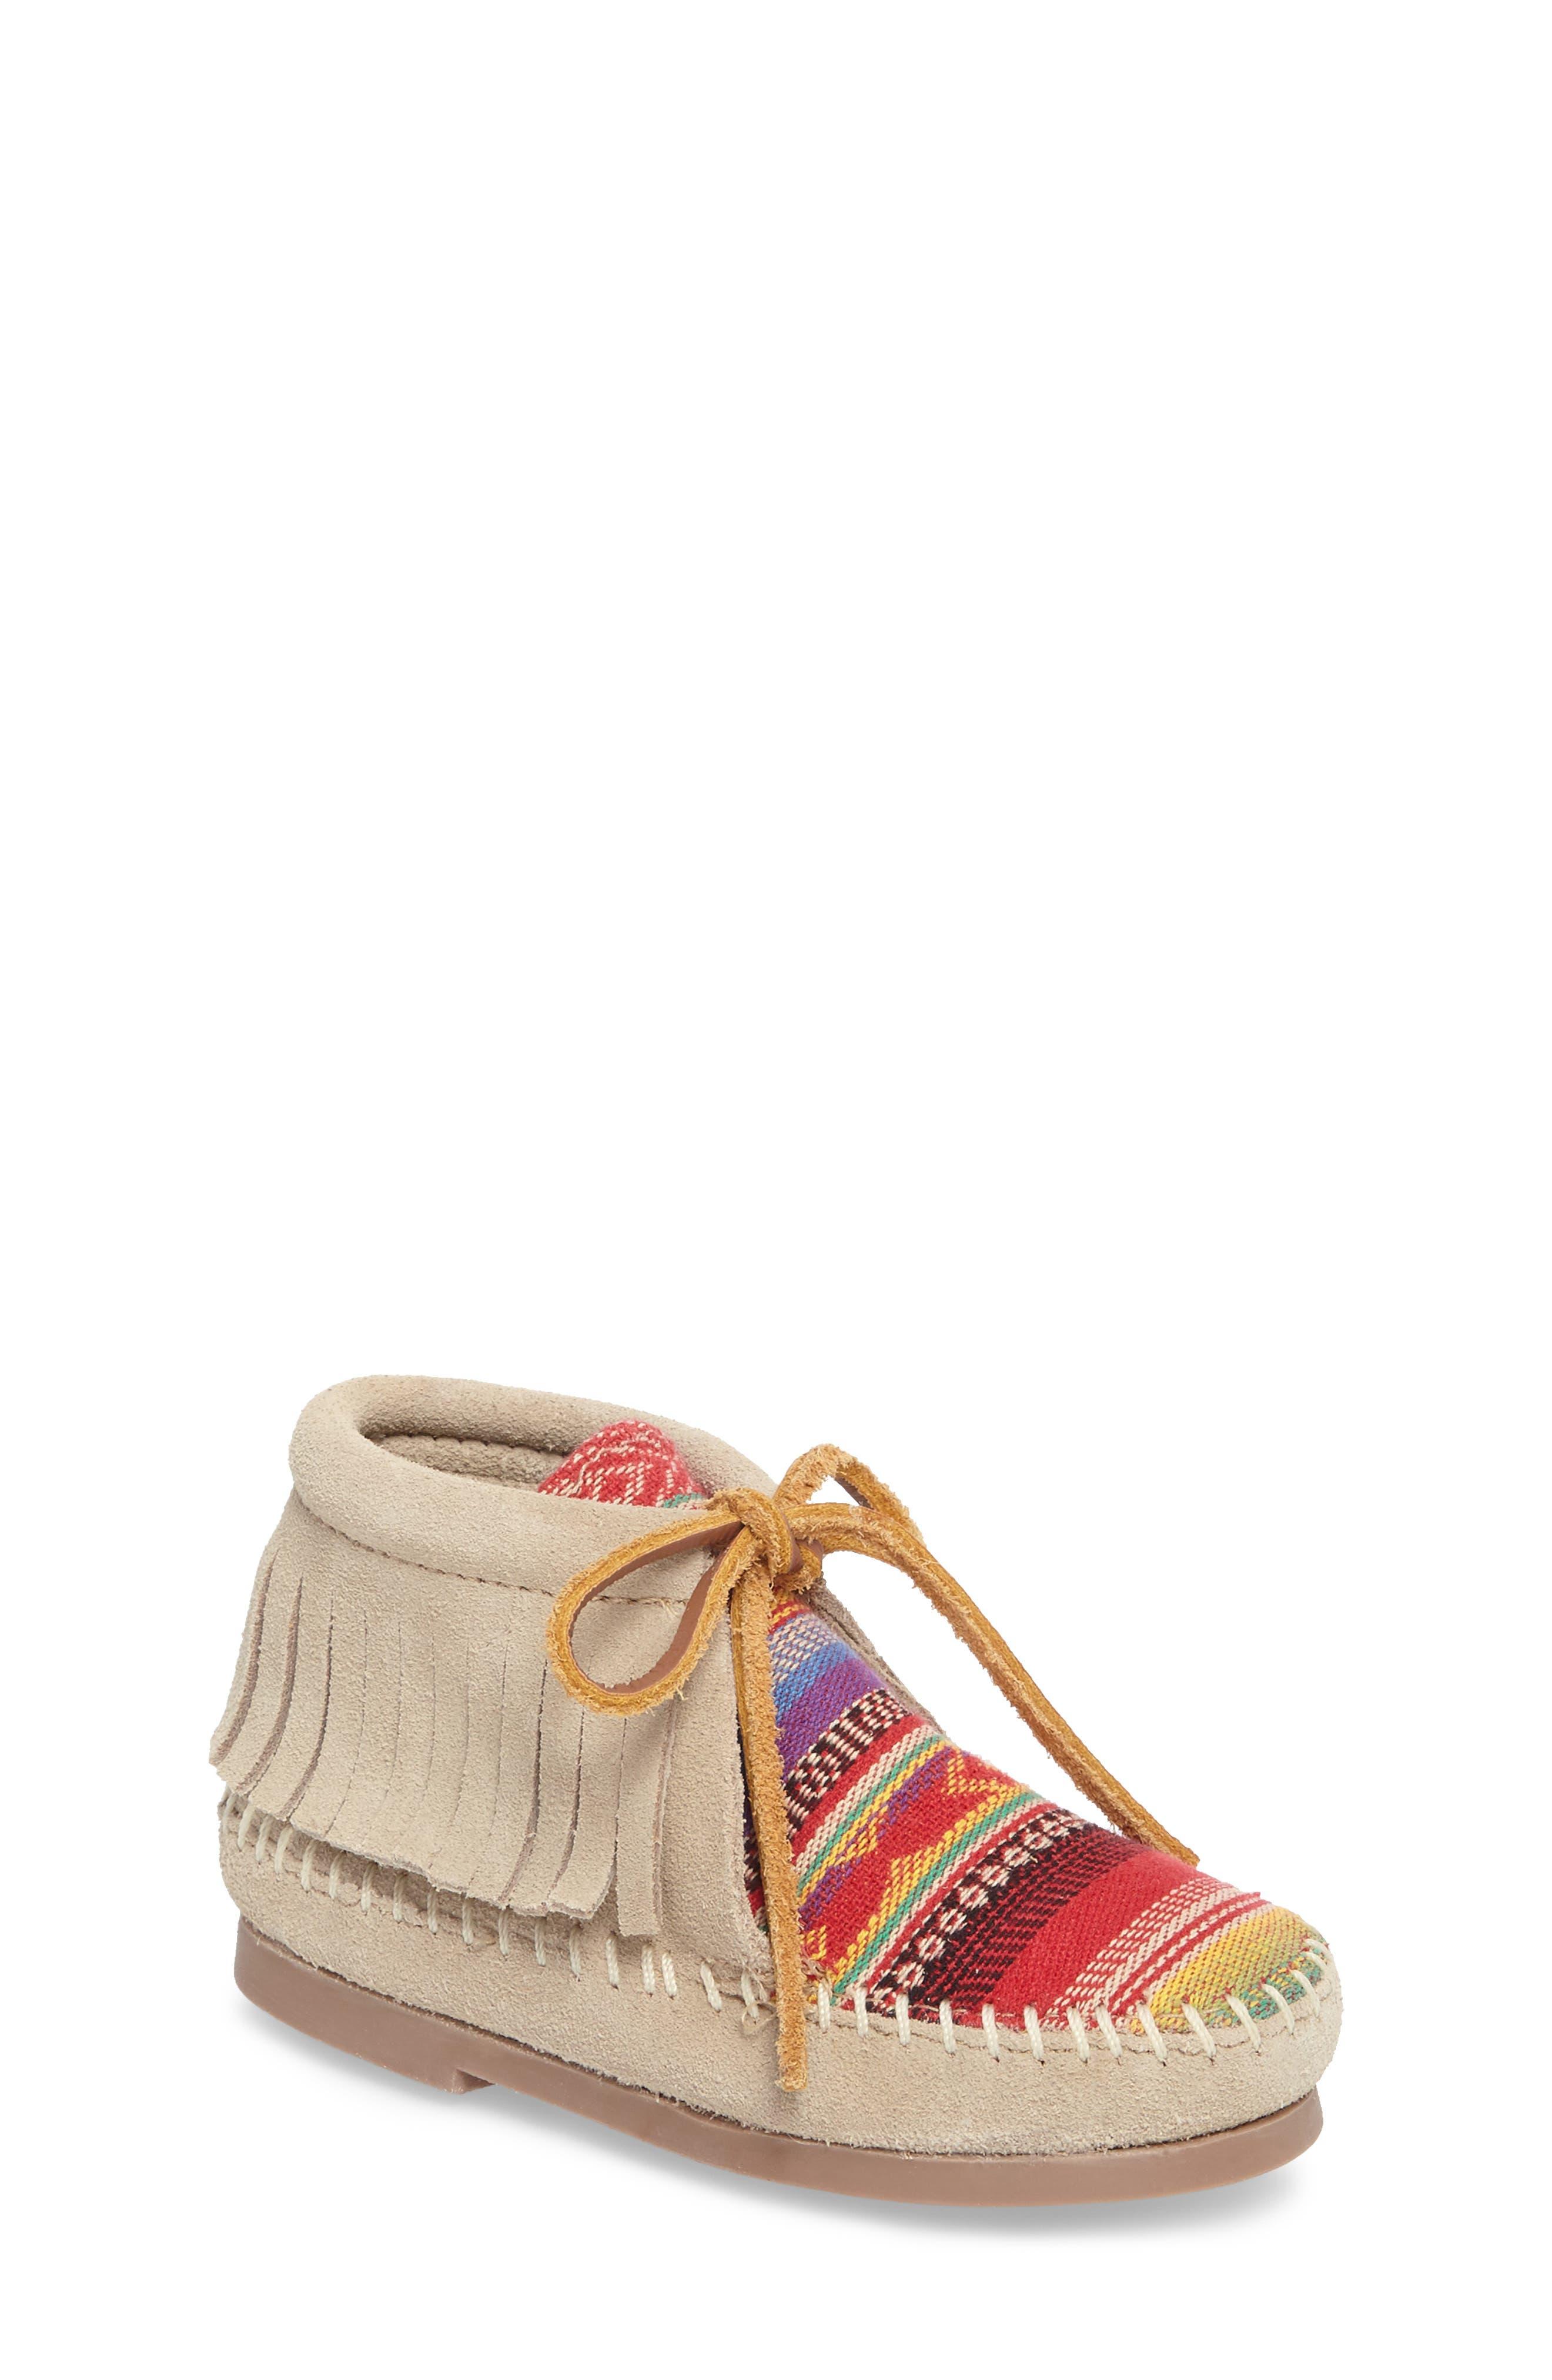 Alternate Image 1 Selected - Minnetonka Frisco Chukka Boot (Walker, Toddler, Little Kid & Big Kid)